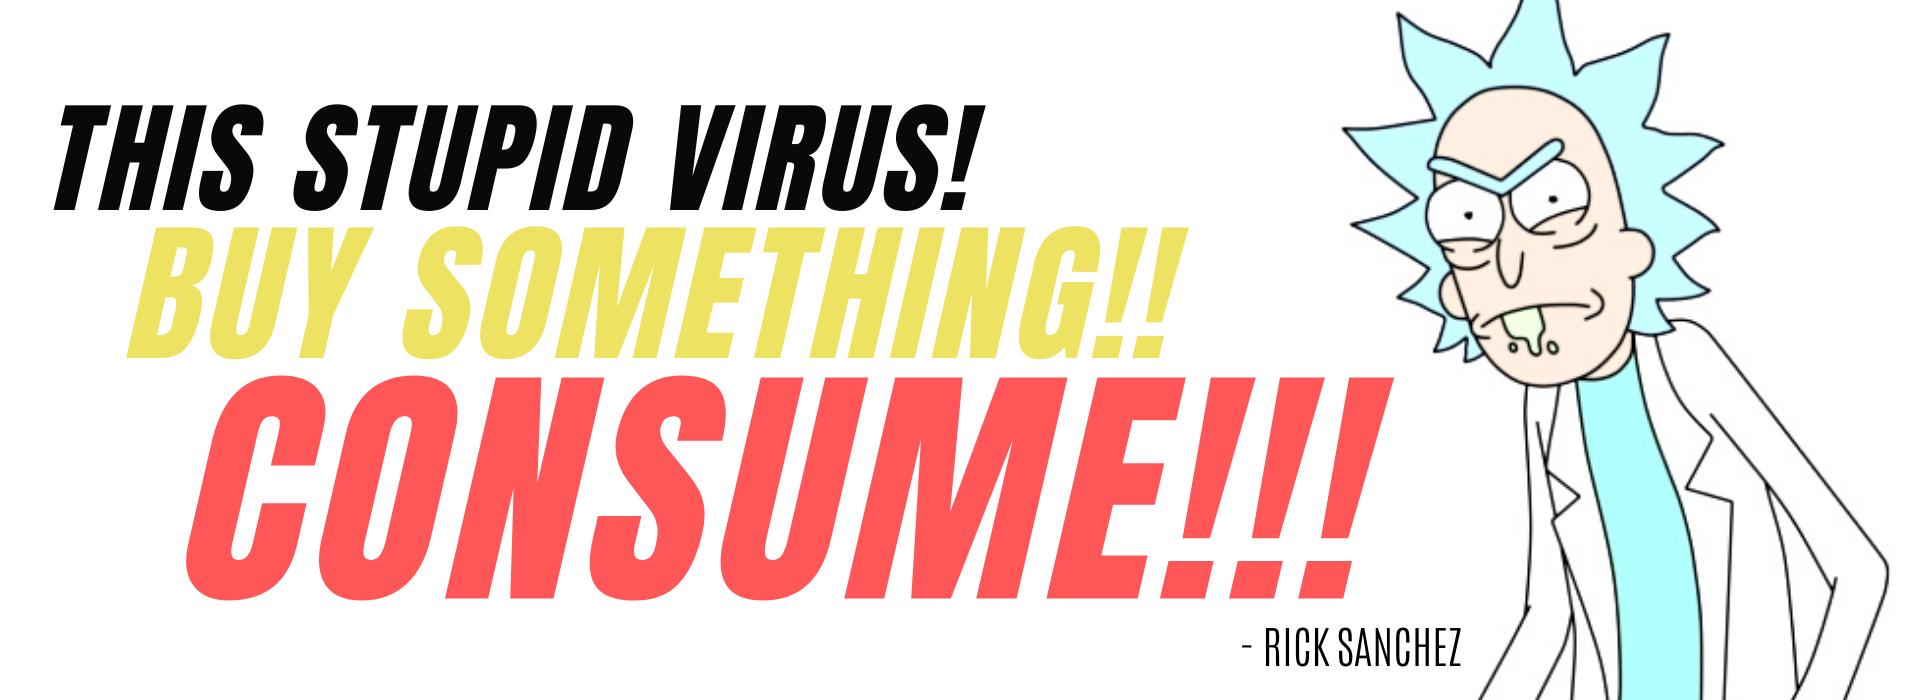 CultSub T-Shirts Rick and Morty Mega Fan T-Shirt Collection Buy Covid Consume Rick Sanchez